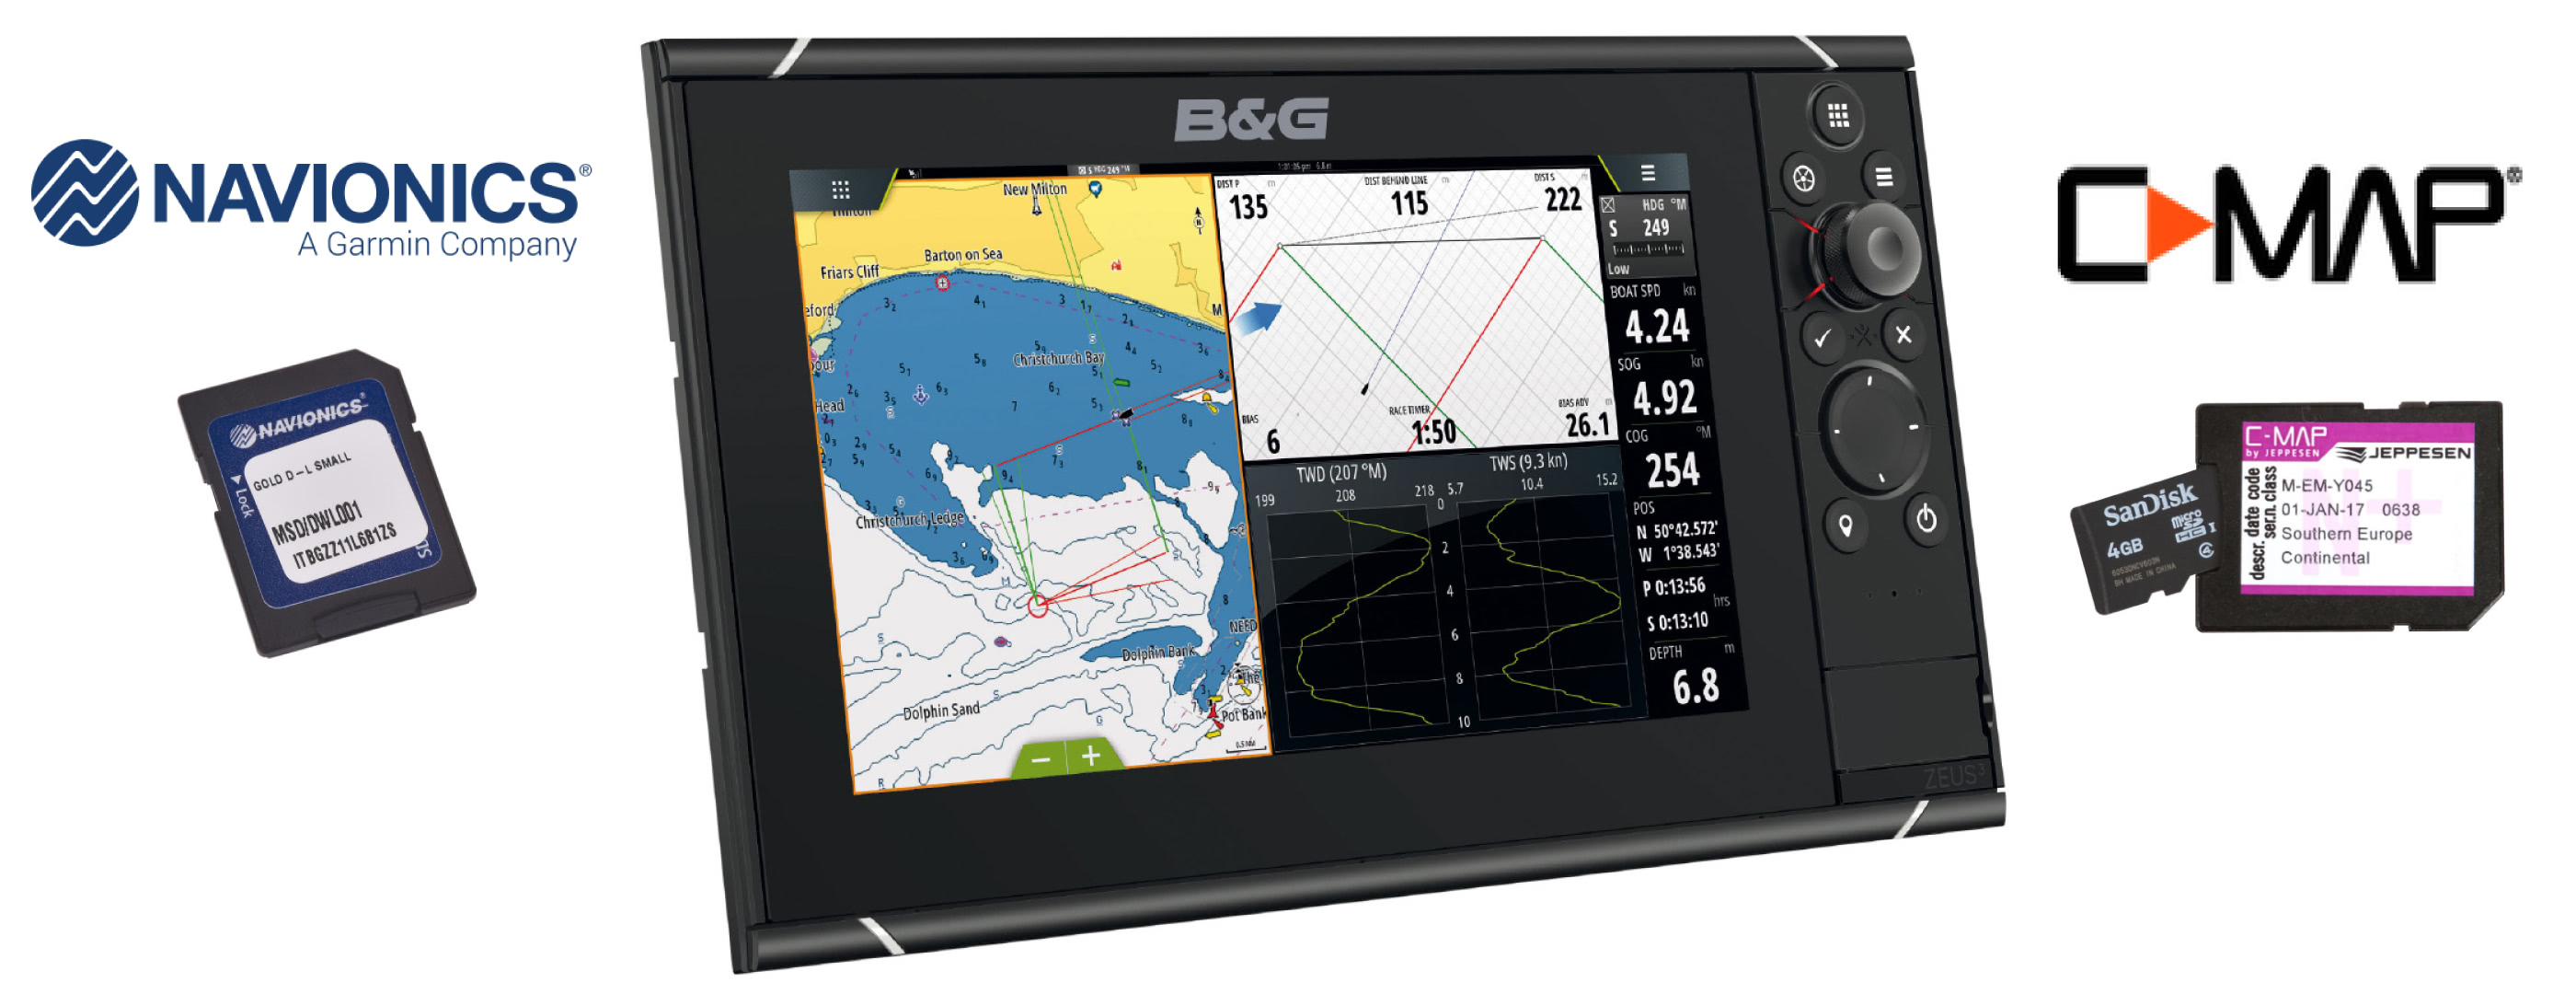 ZEUS nautical charts